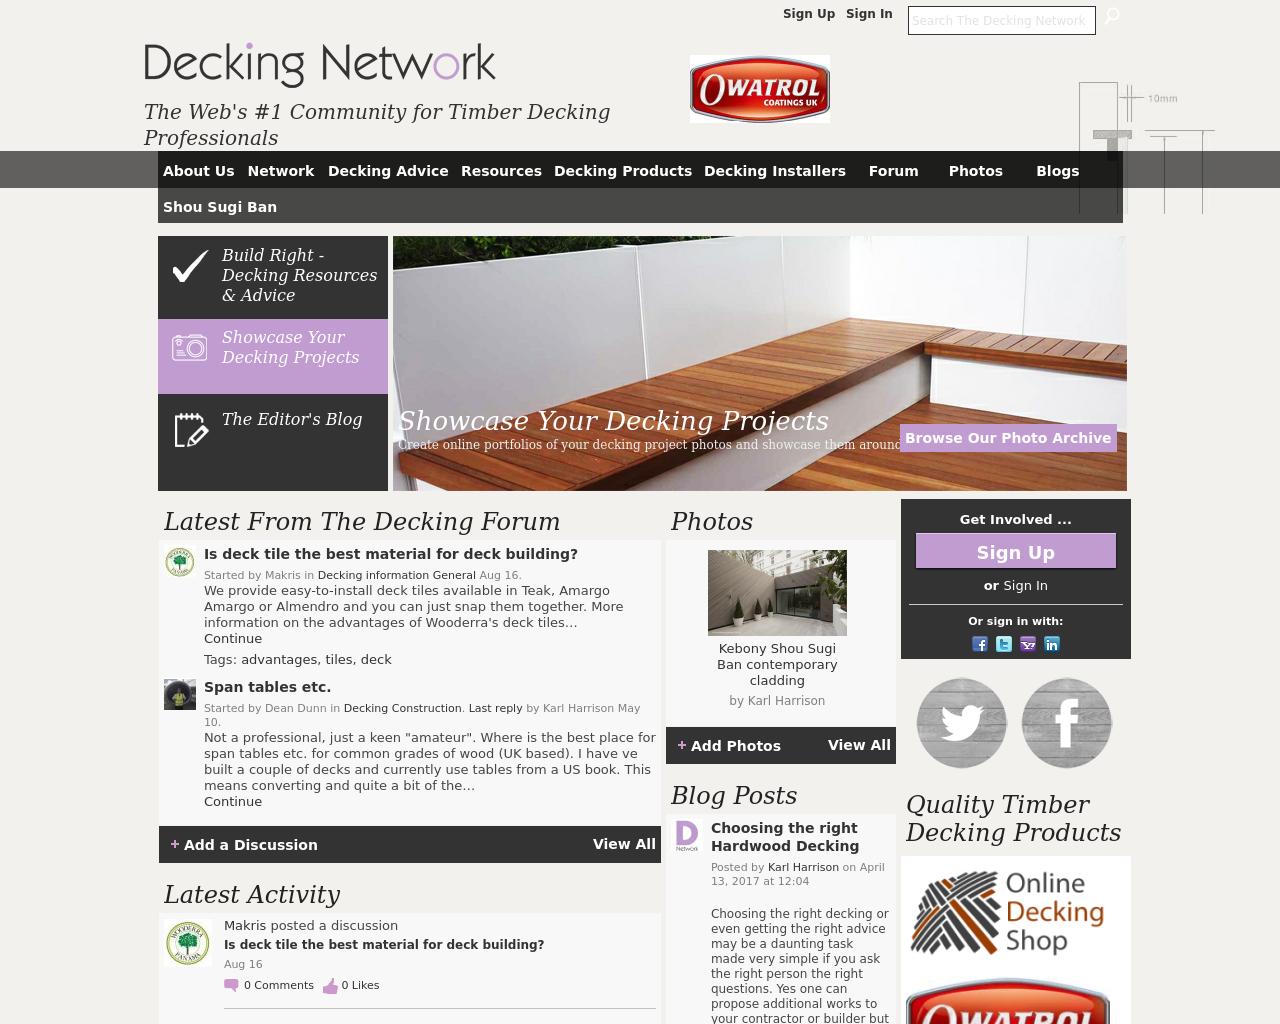 Decking-Network-Advertising-Reviews-Pricing